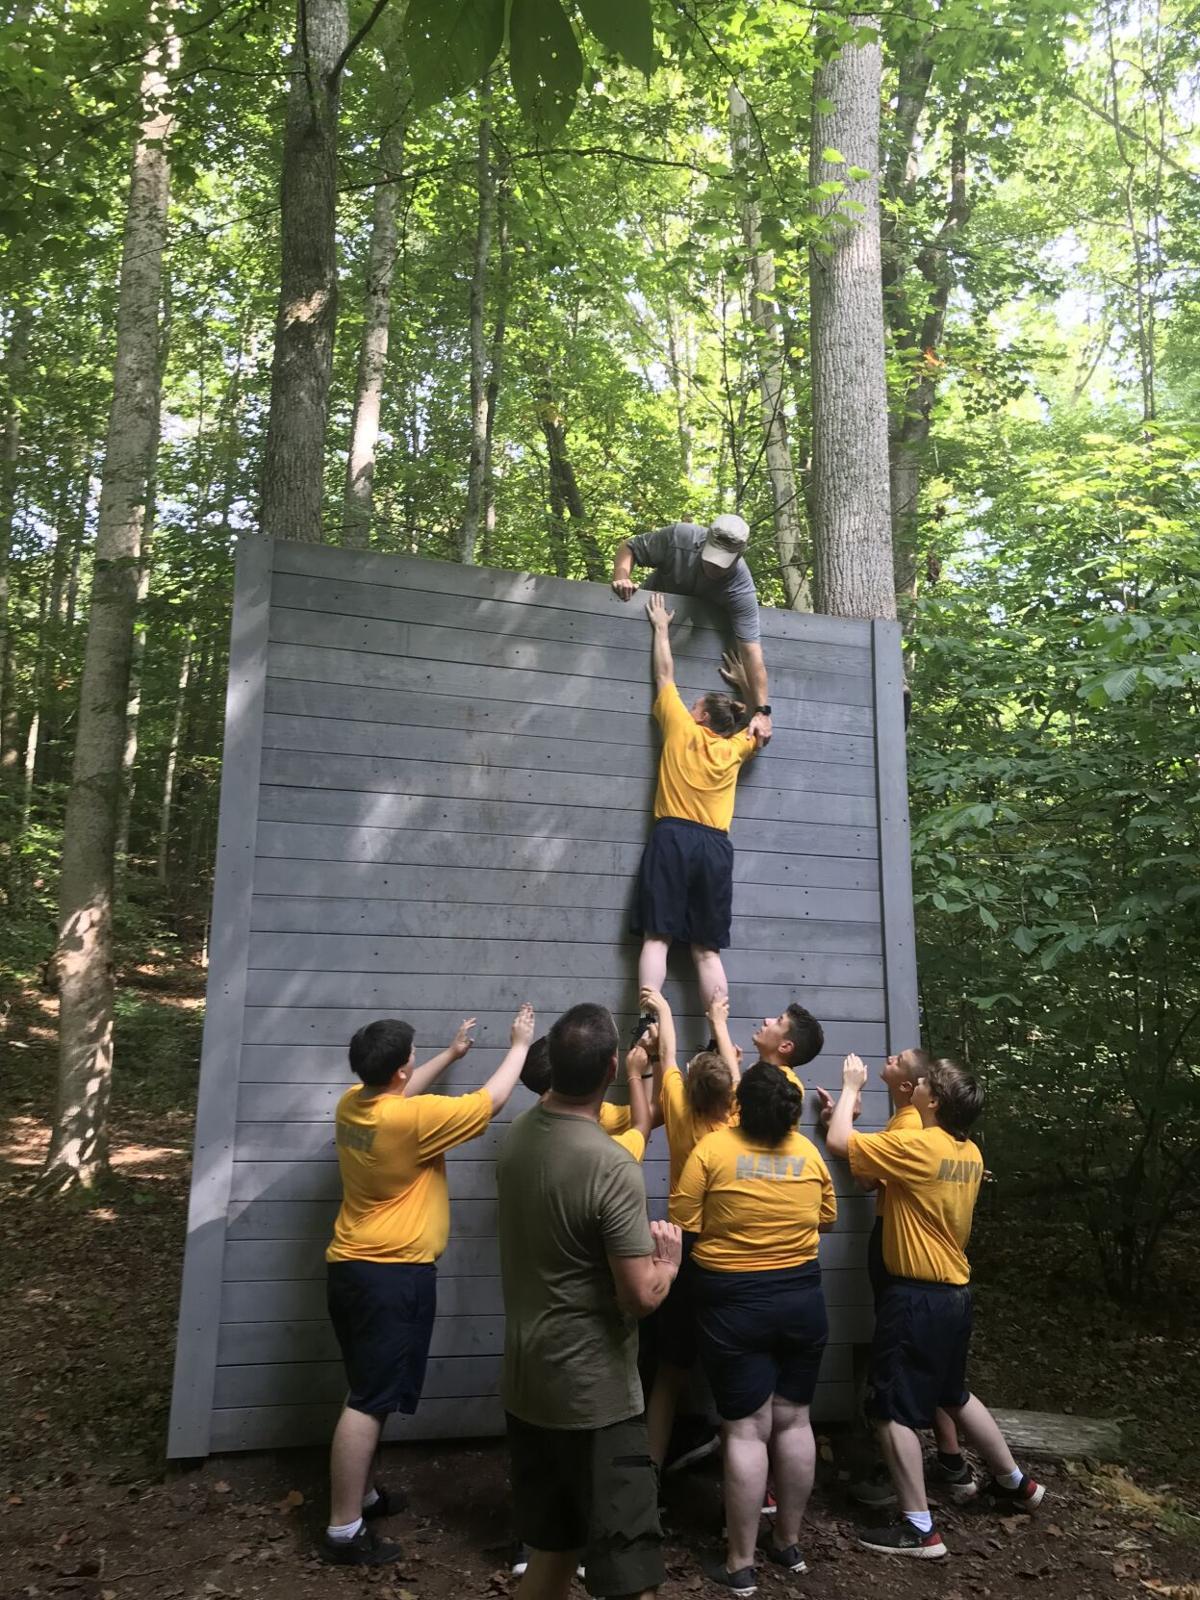 Volunteer High School NJROTC conducts team building